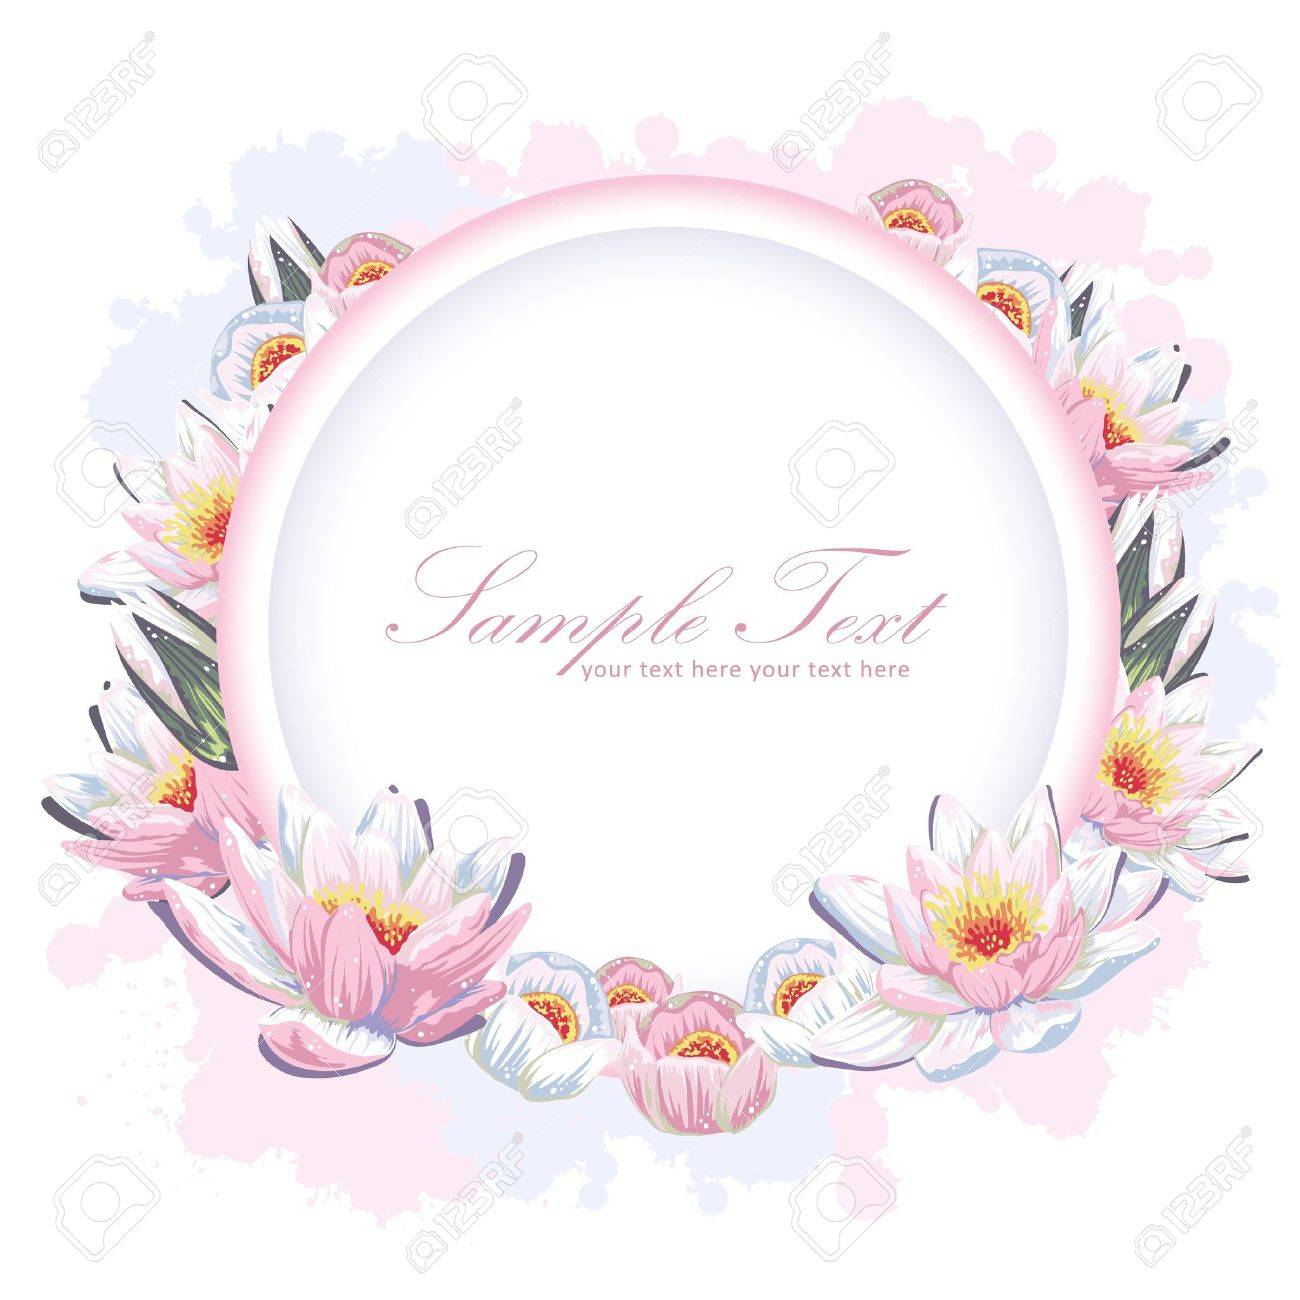 elegant colorful flower invitation postcard royalty free cliparts